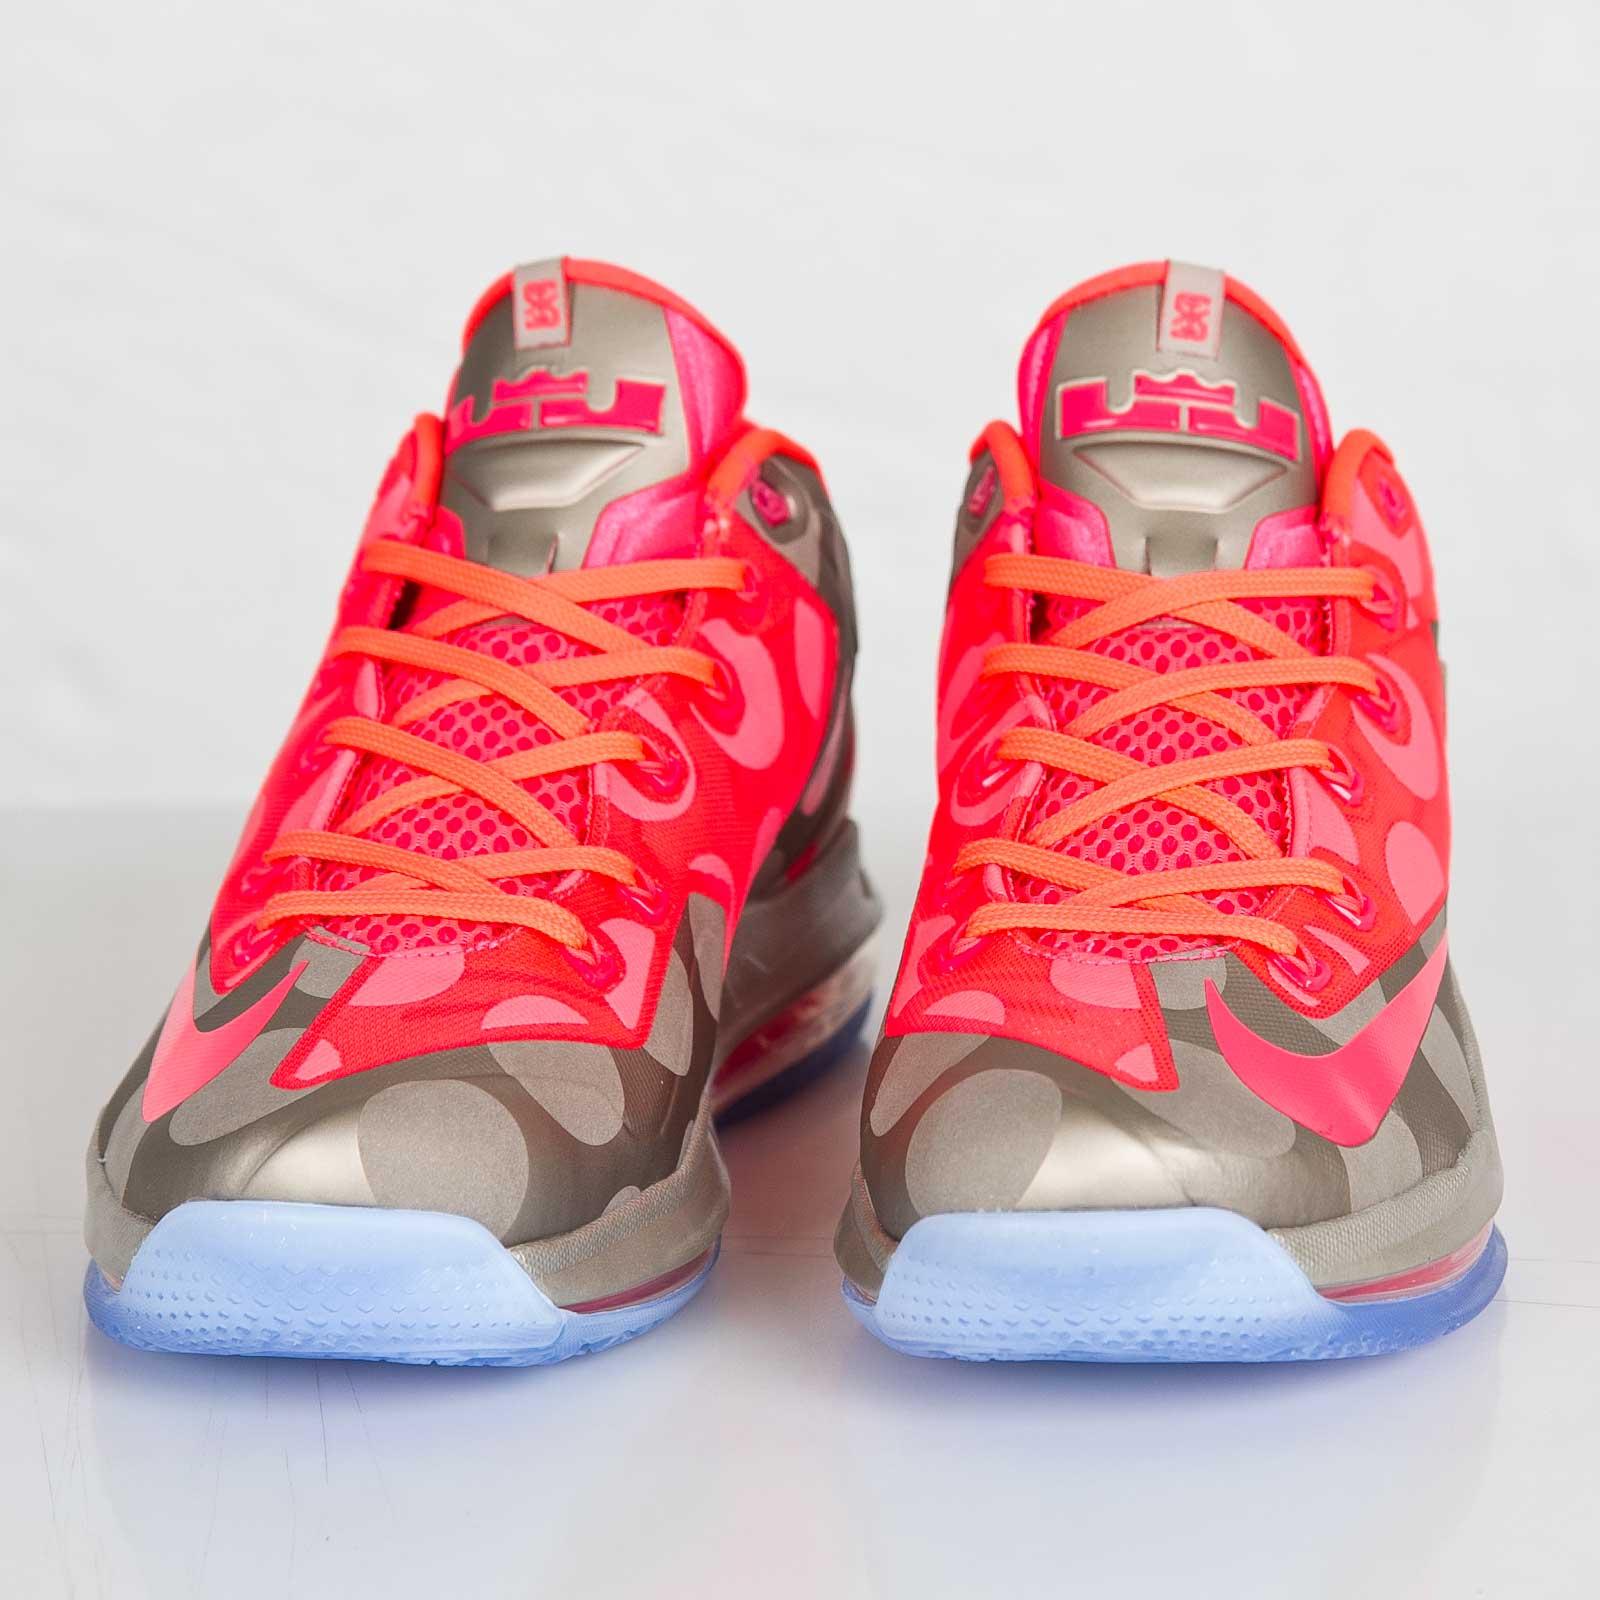 7855368cea724 Nike Max LeBron XI Low Elite Collection - 683256-064 ...